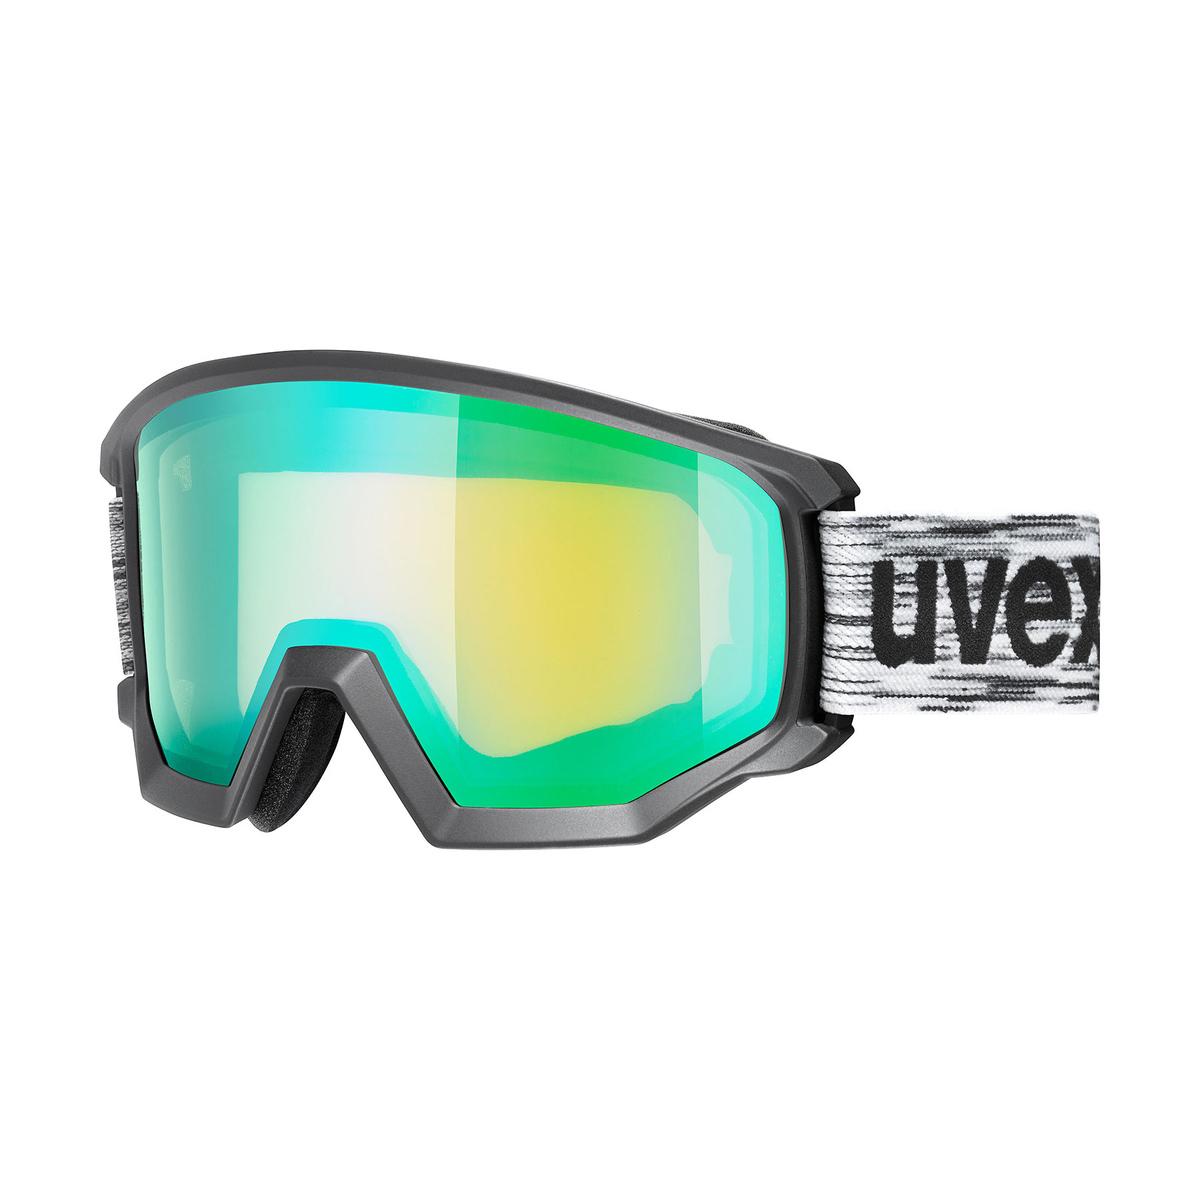 Prezzi Uvex maschera athletic fm